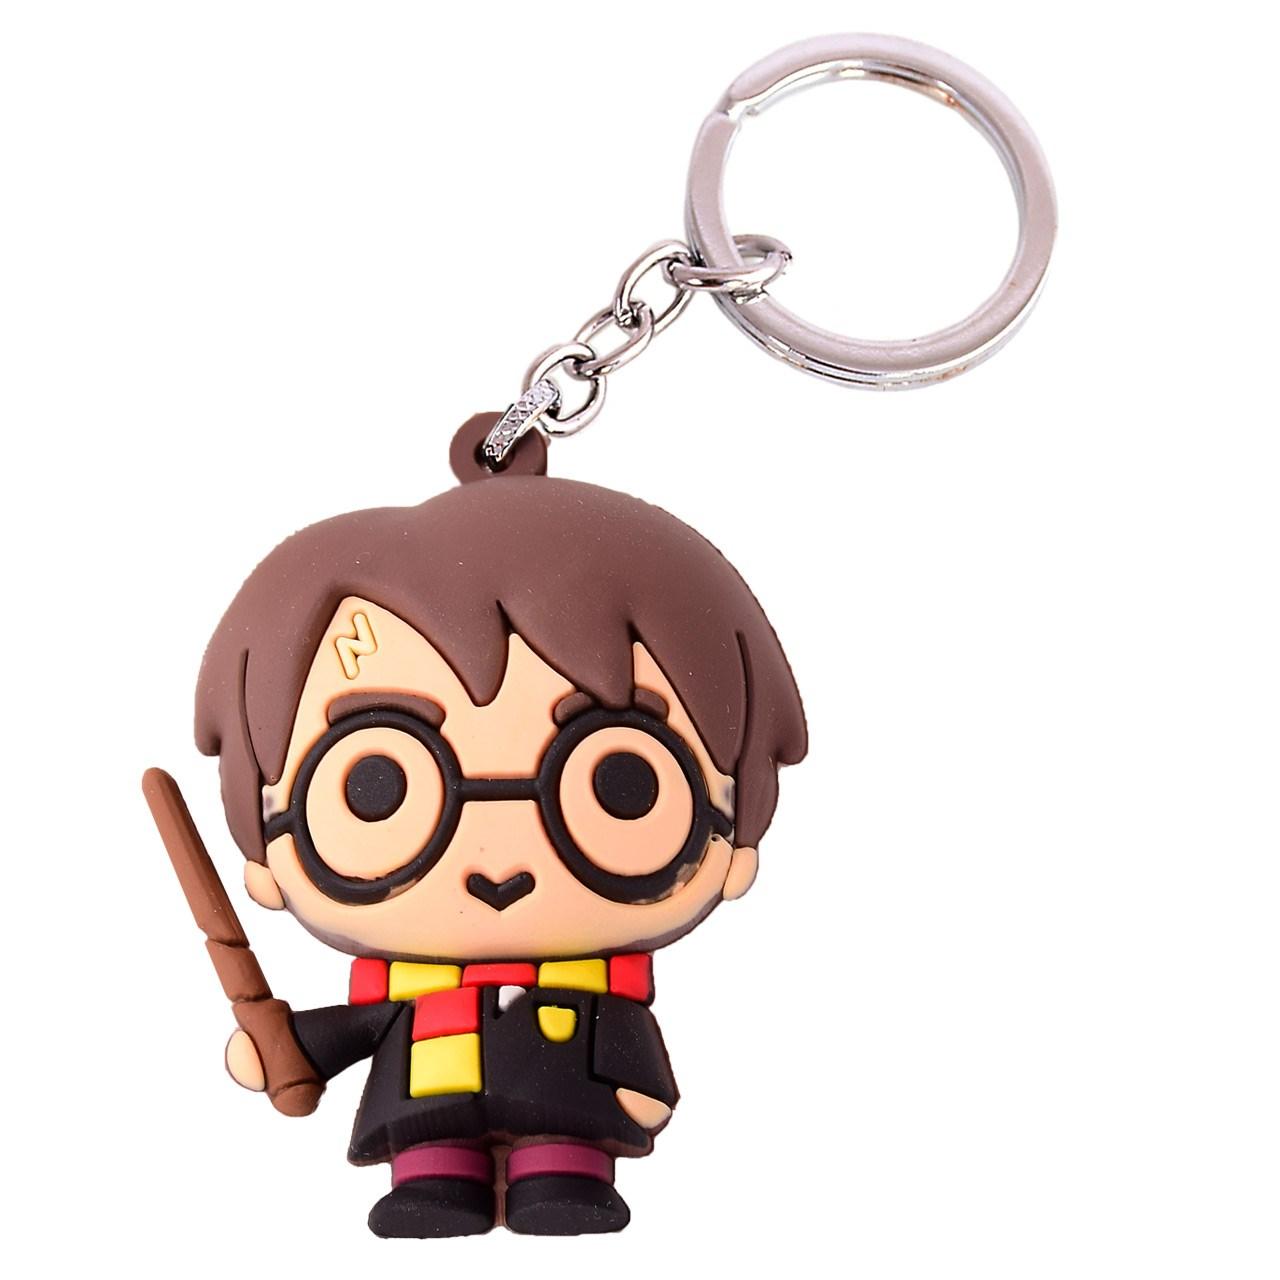 جاسوییچی طرح هری پاتر مدل Harry Potter with Wand